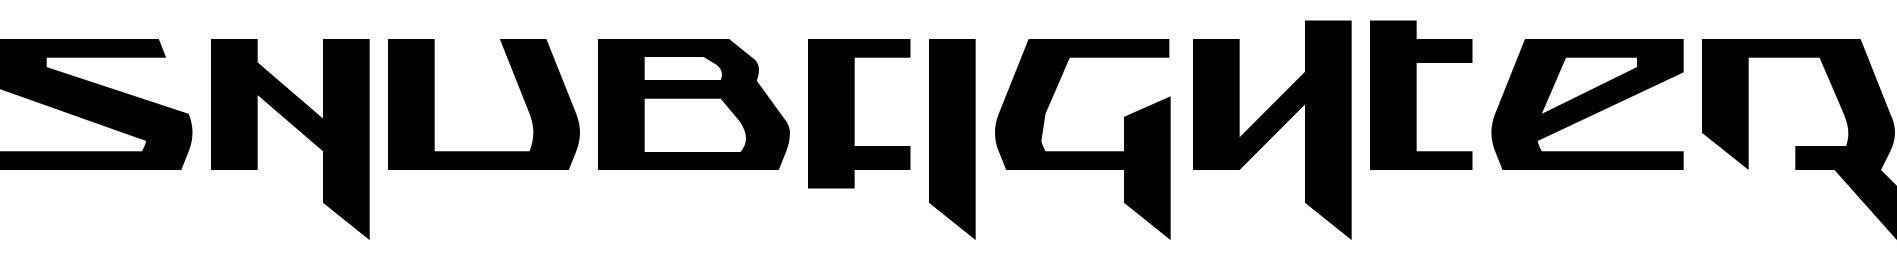 Snubfighter